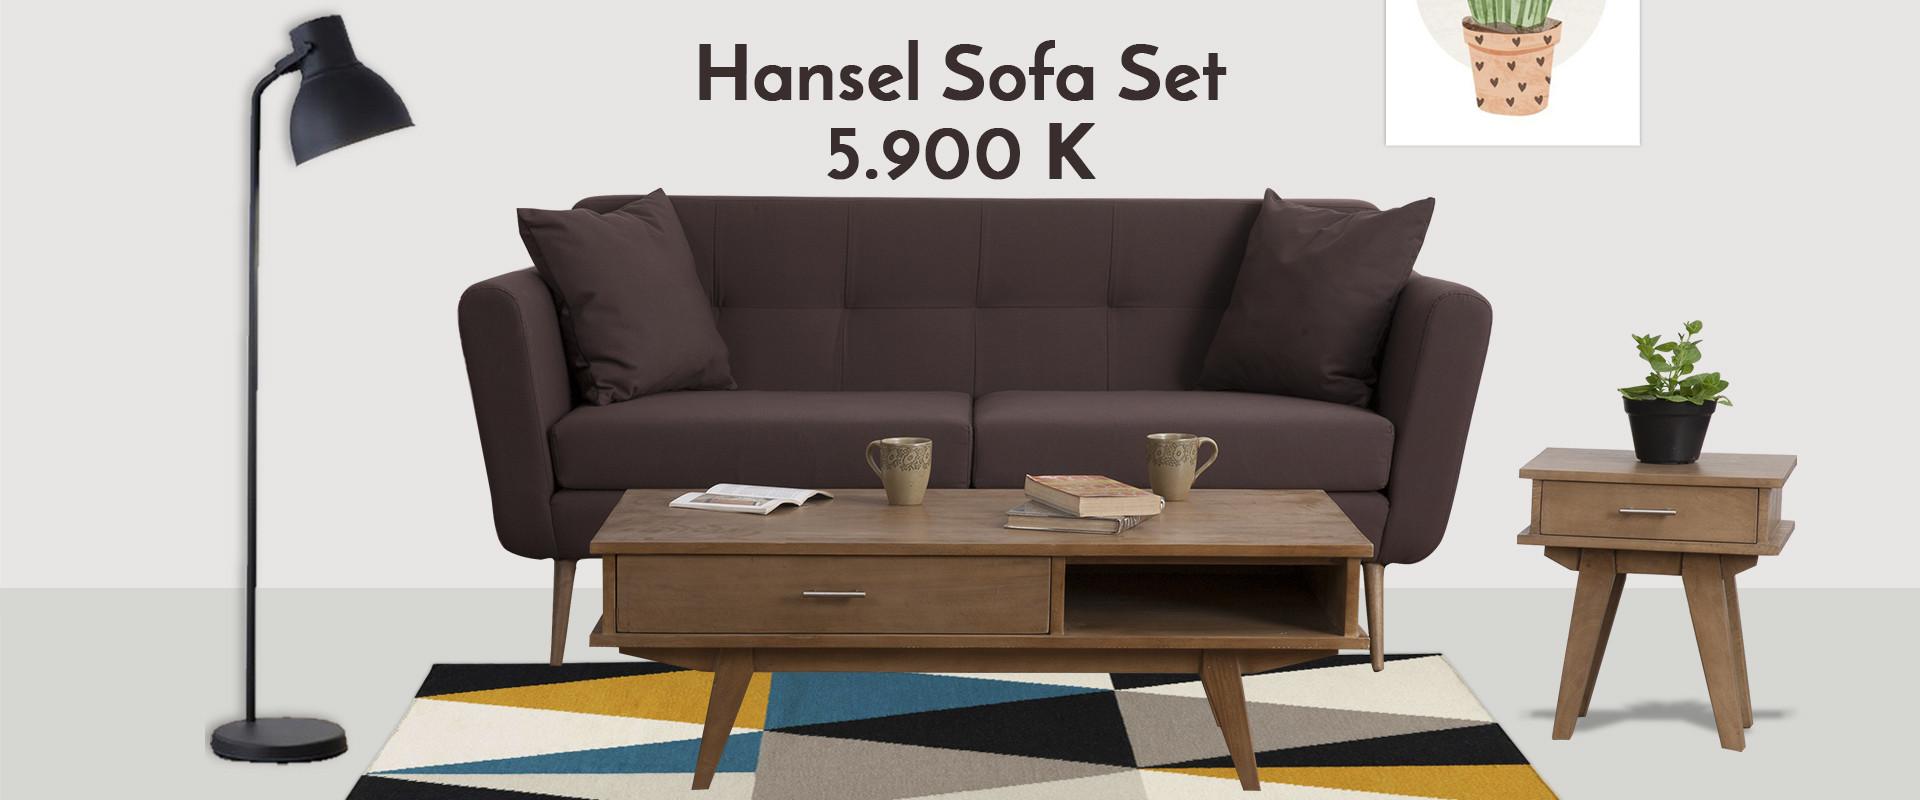 Hansel Sofa set